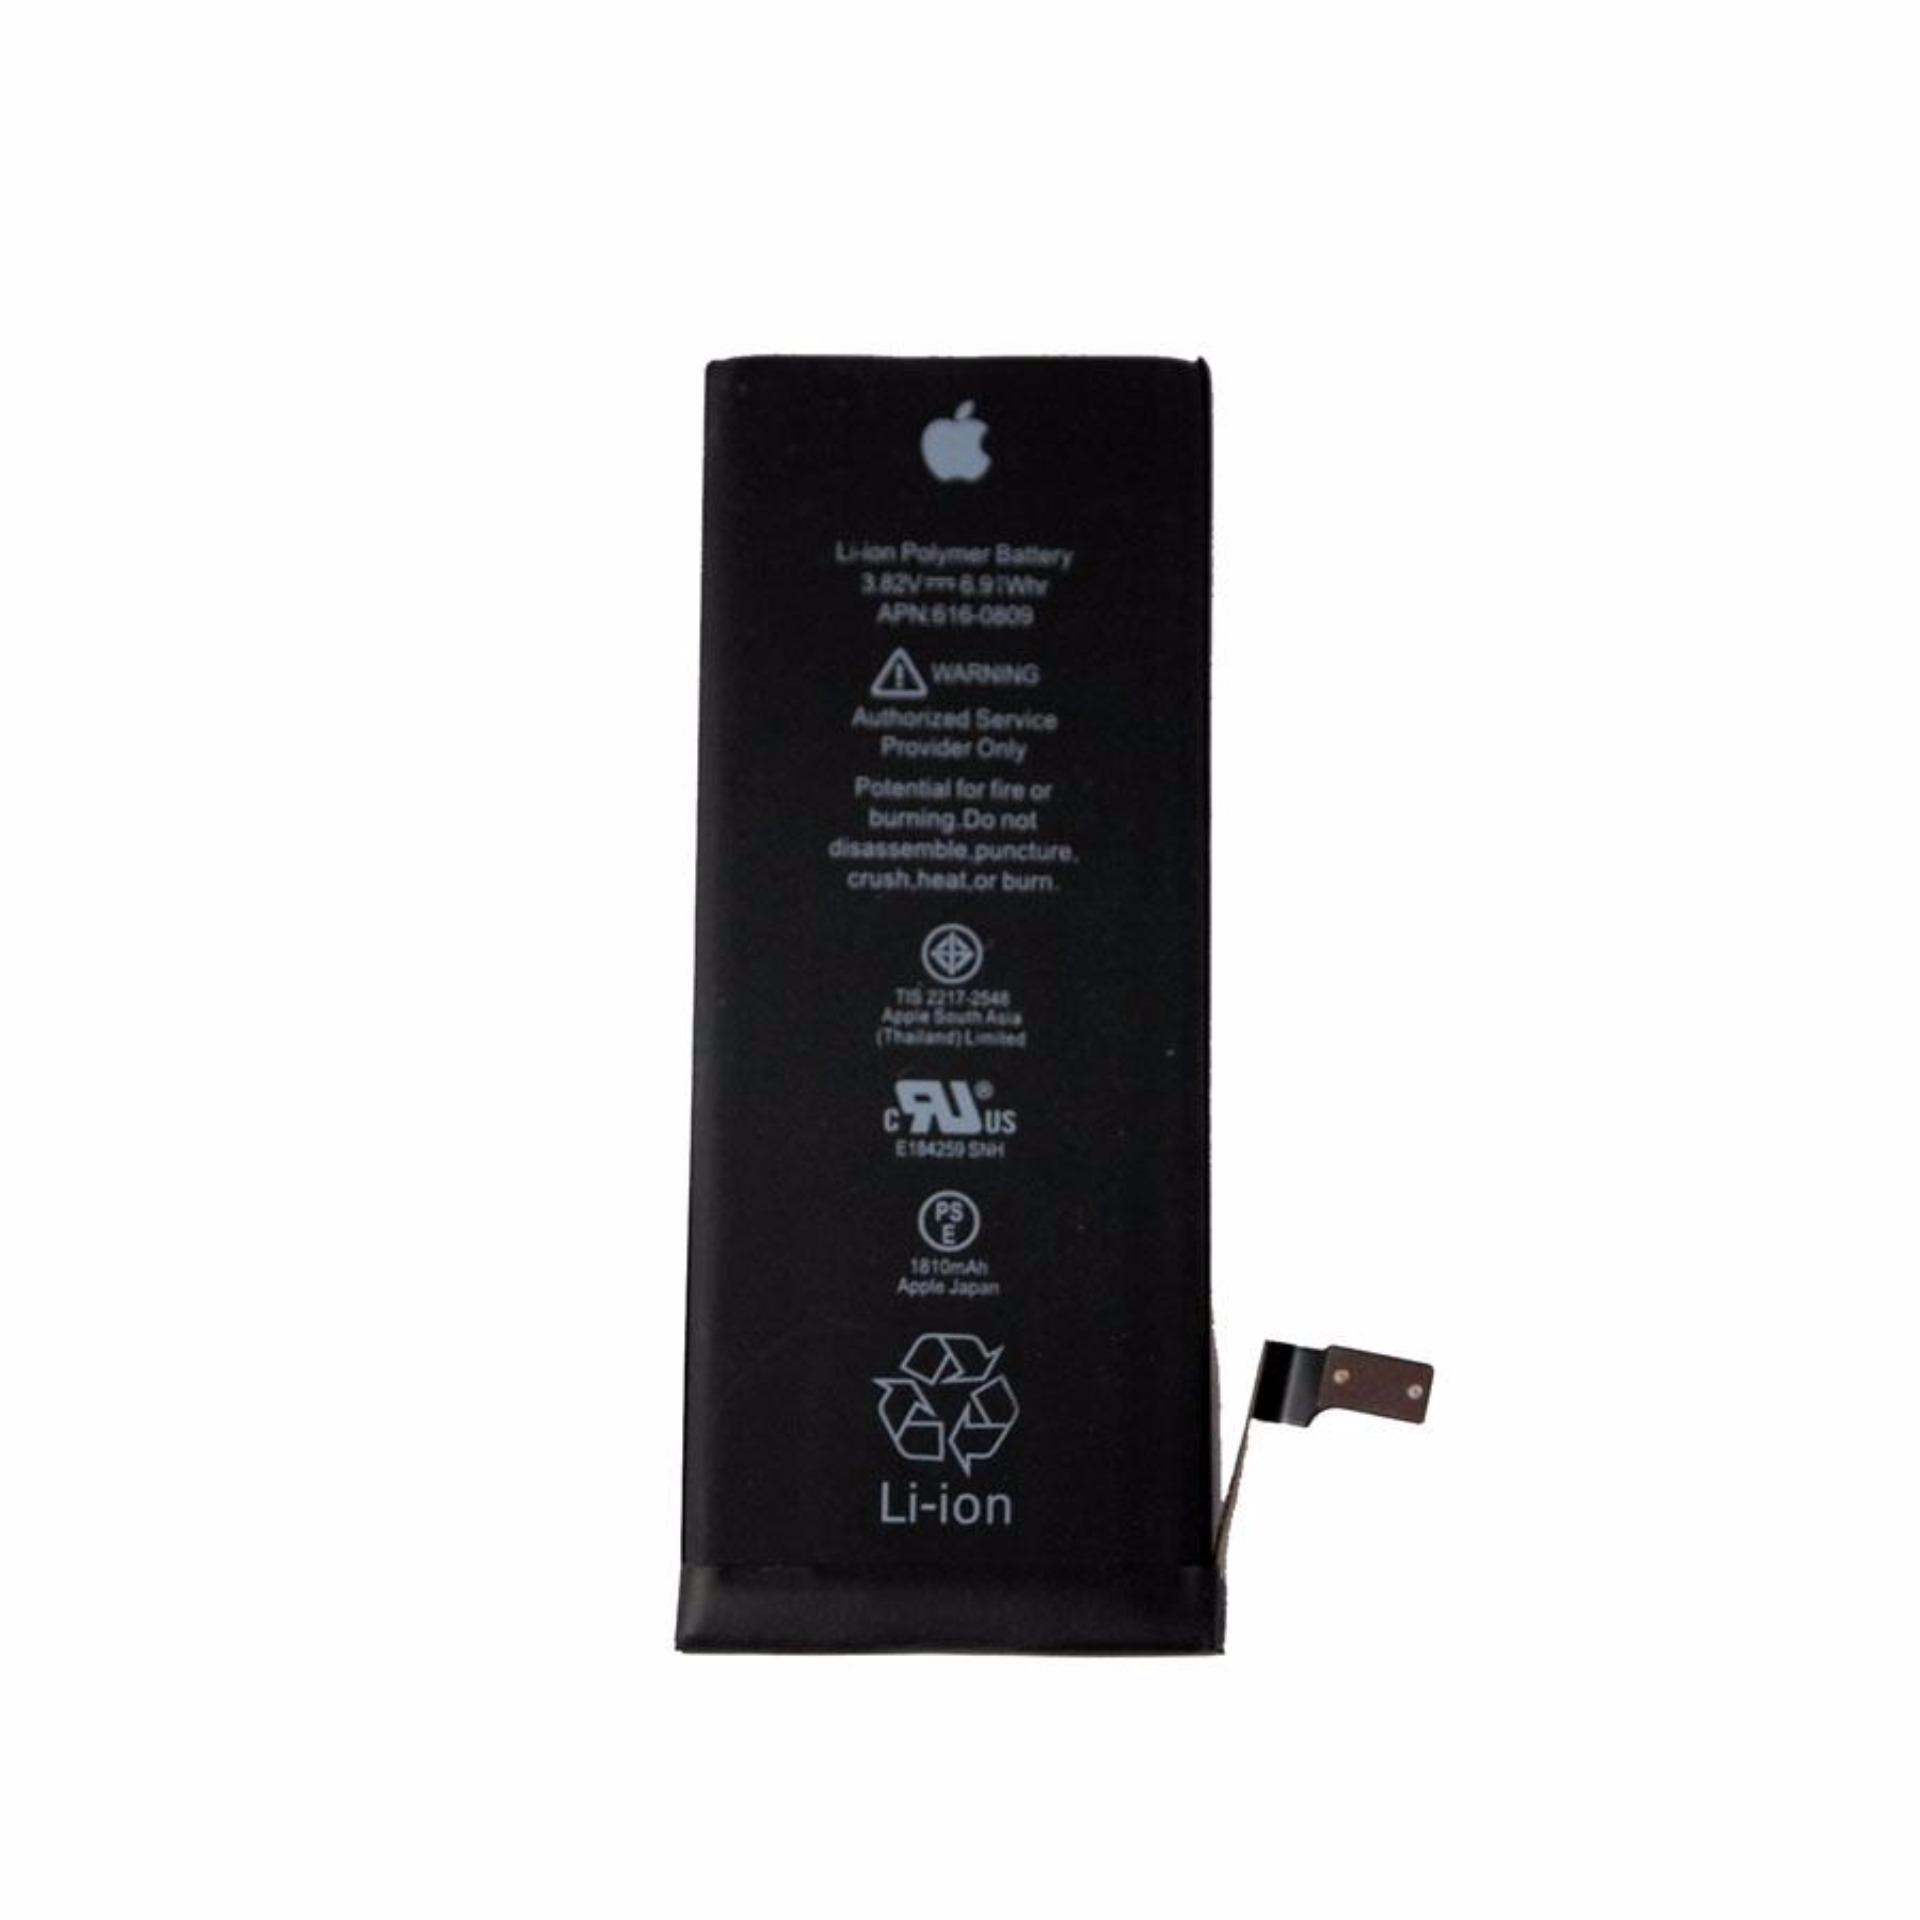 Ipod Gen 5 Touch Batere Battery Batre Baterai Daftar Update Harga Iphone 6 6g Gsm Cdma Ori Original